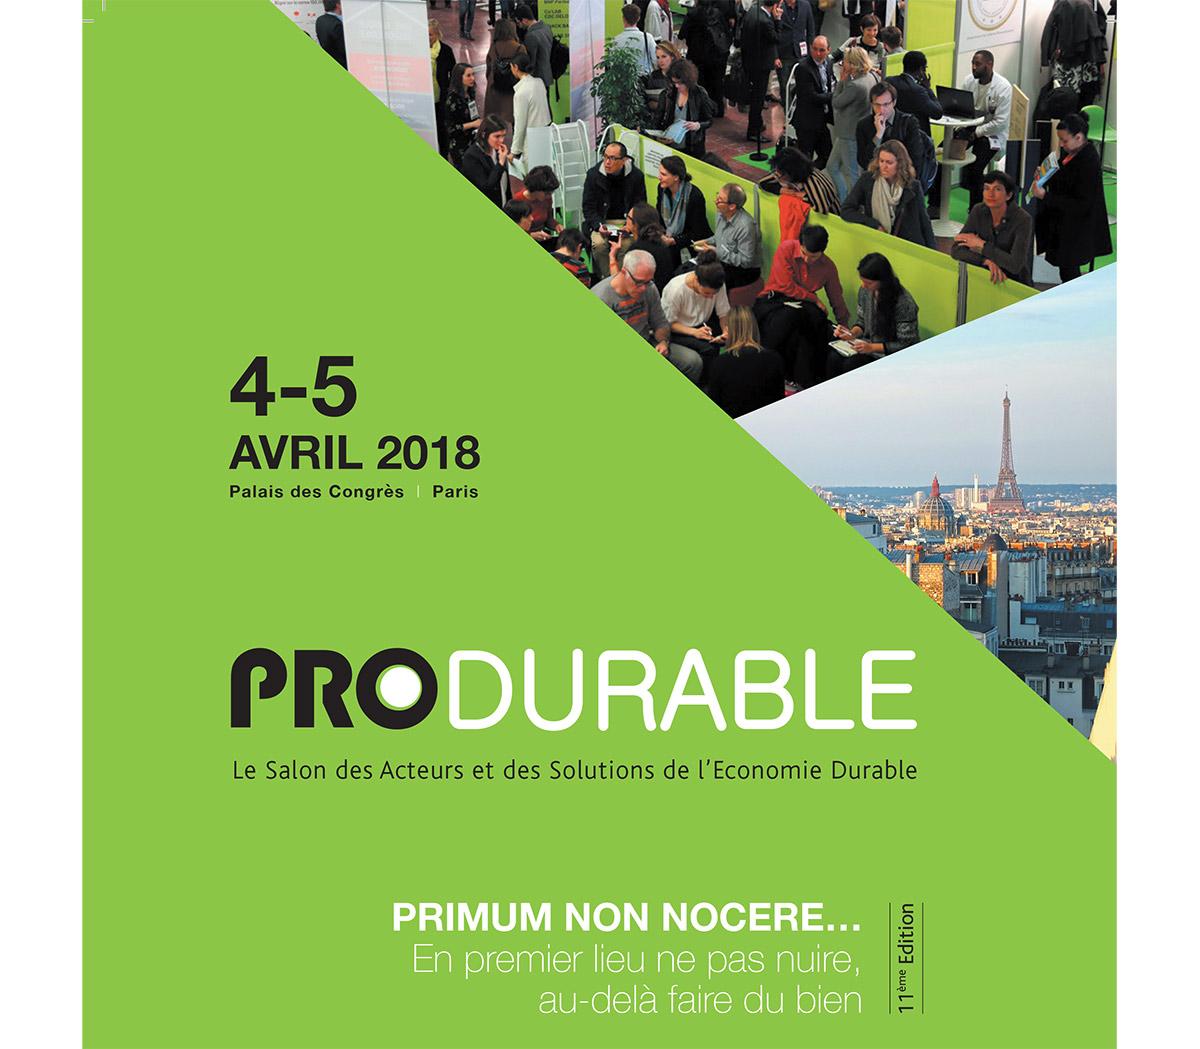 produrable-2018